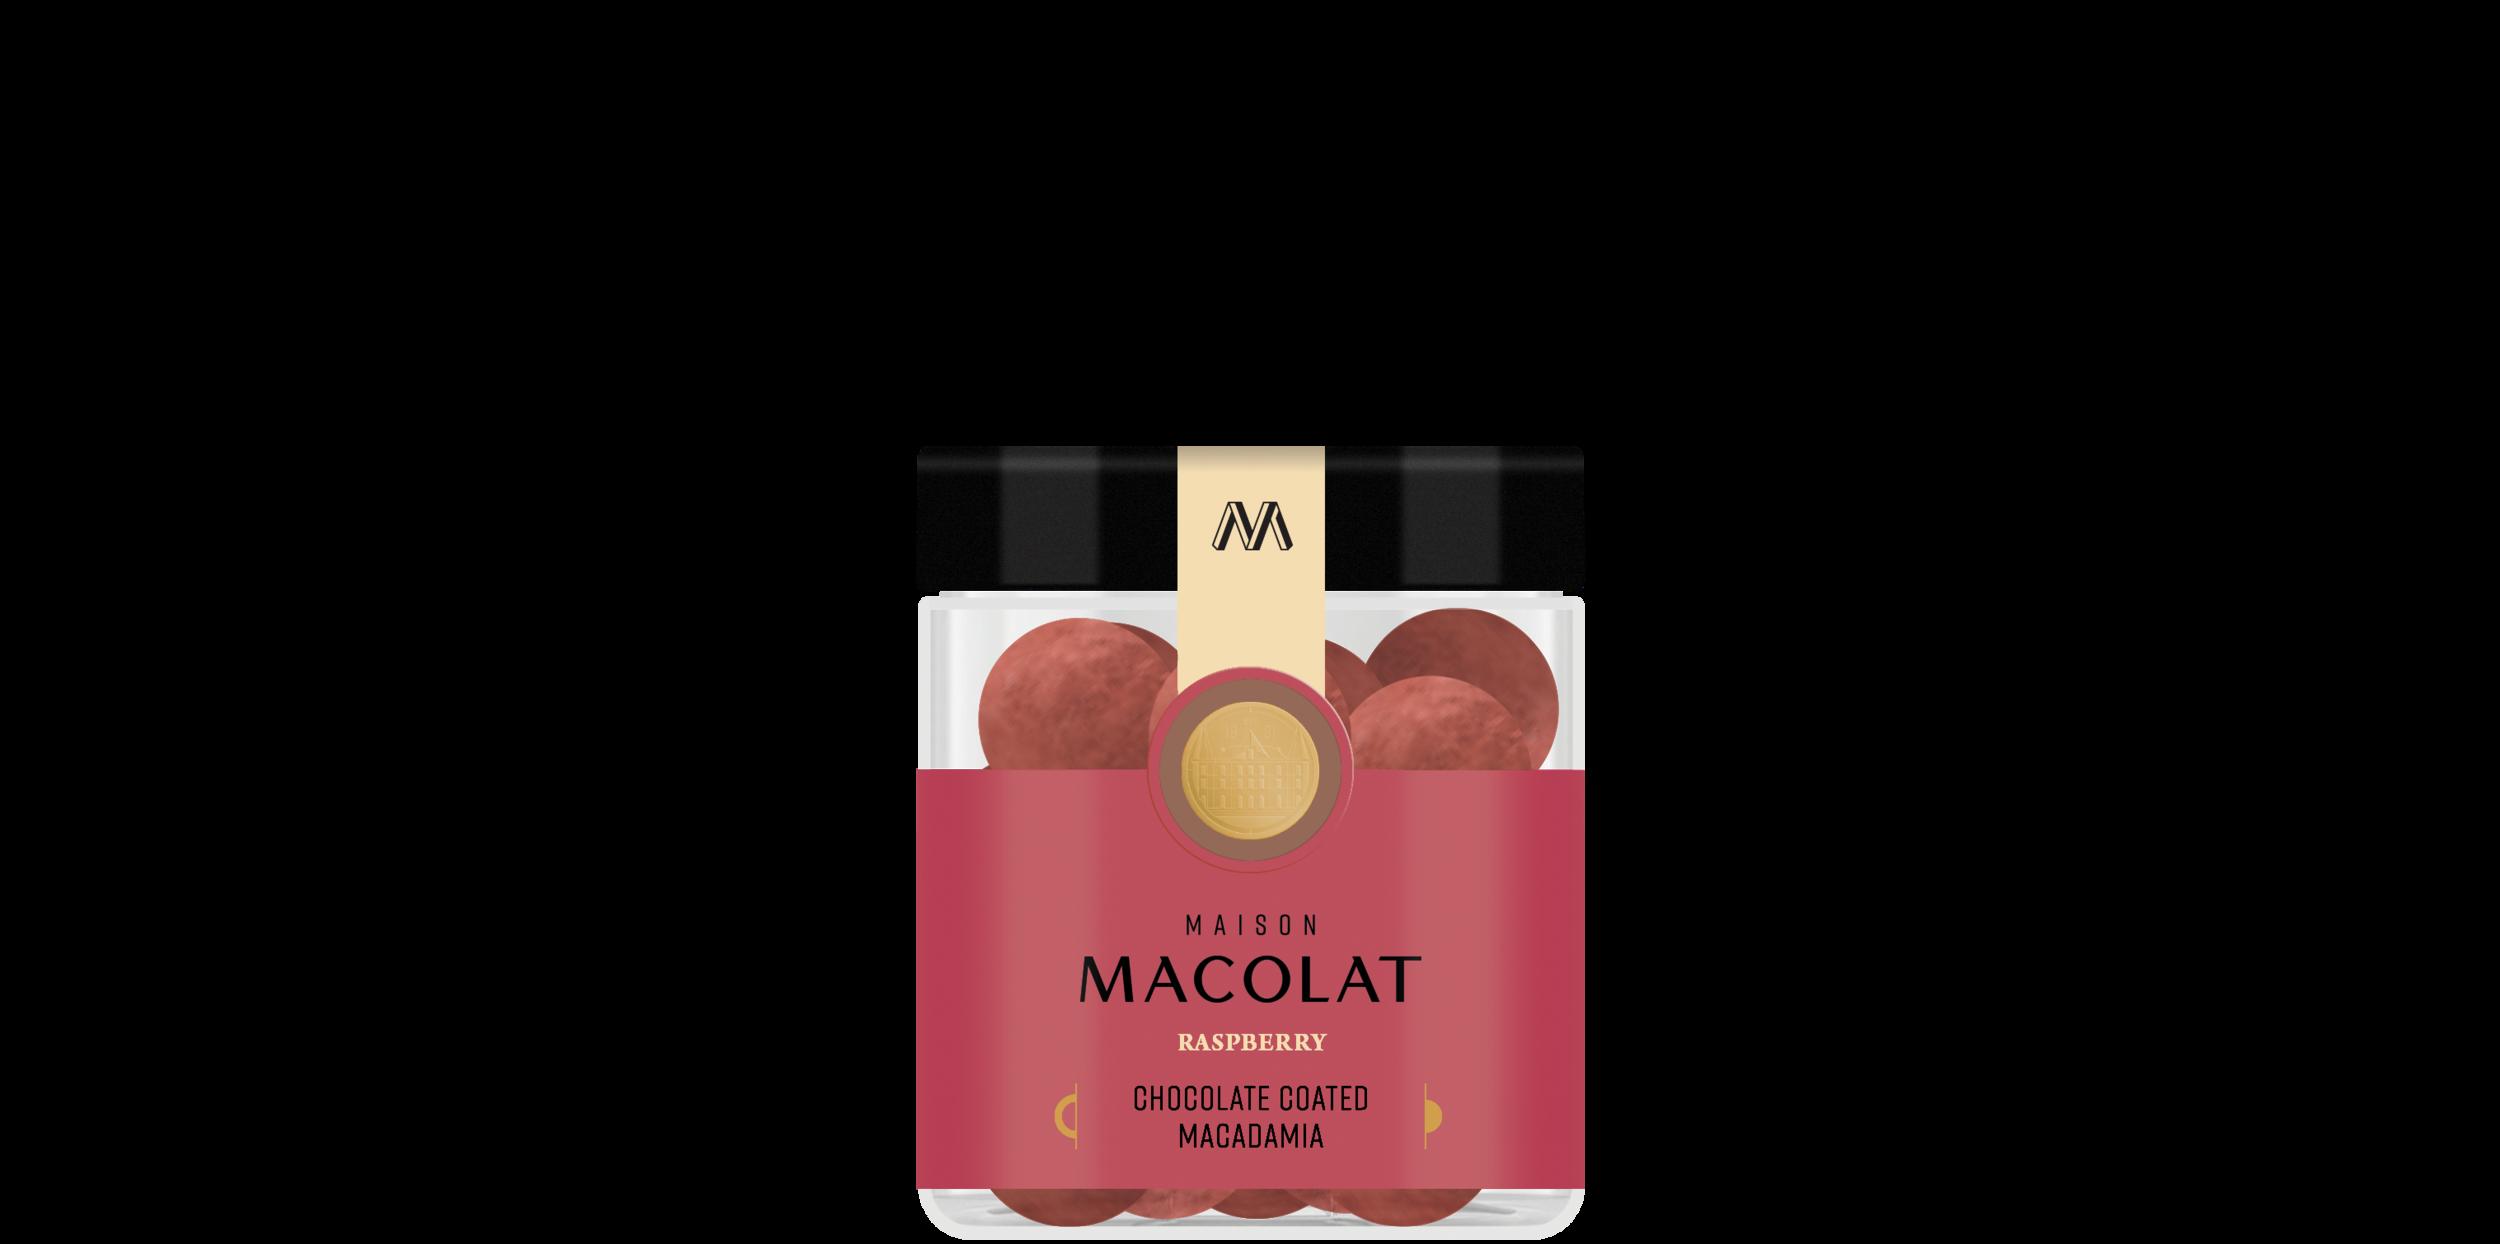 MaisonMacolat_Raspberry_small.png